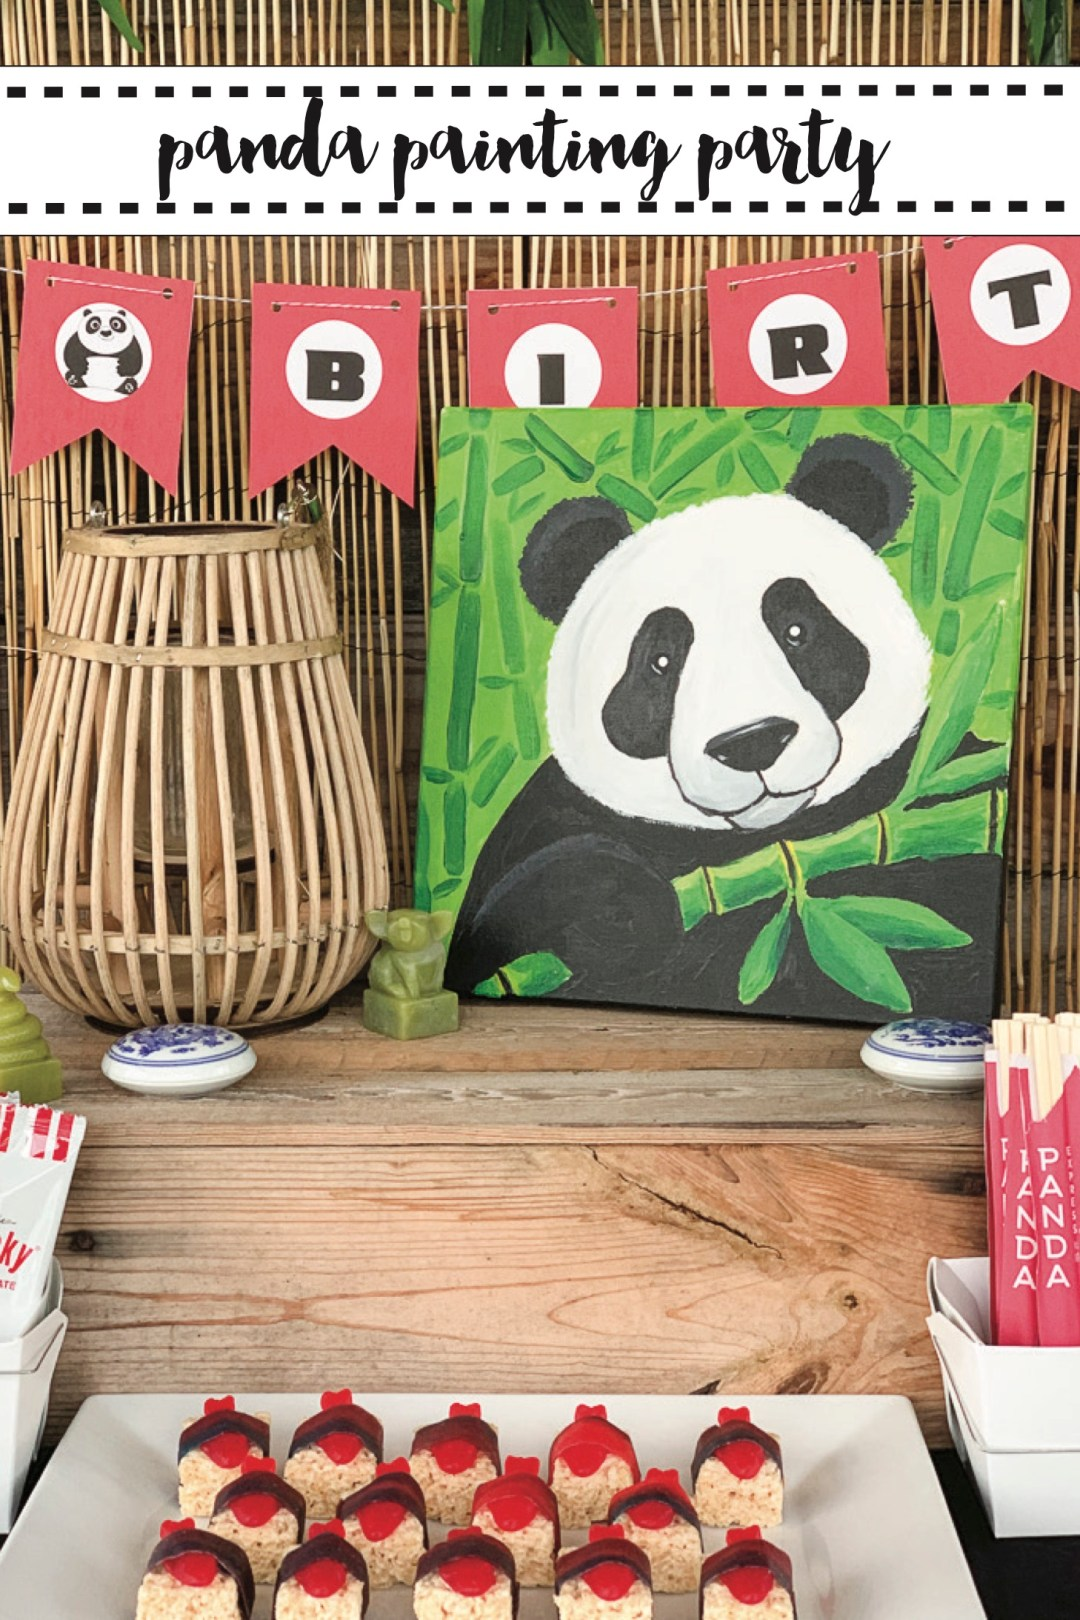 Panda Painting Party